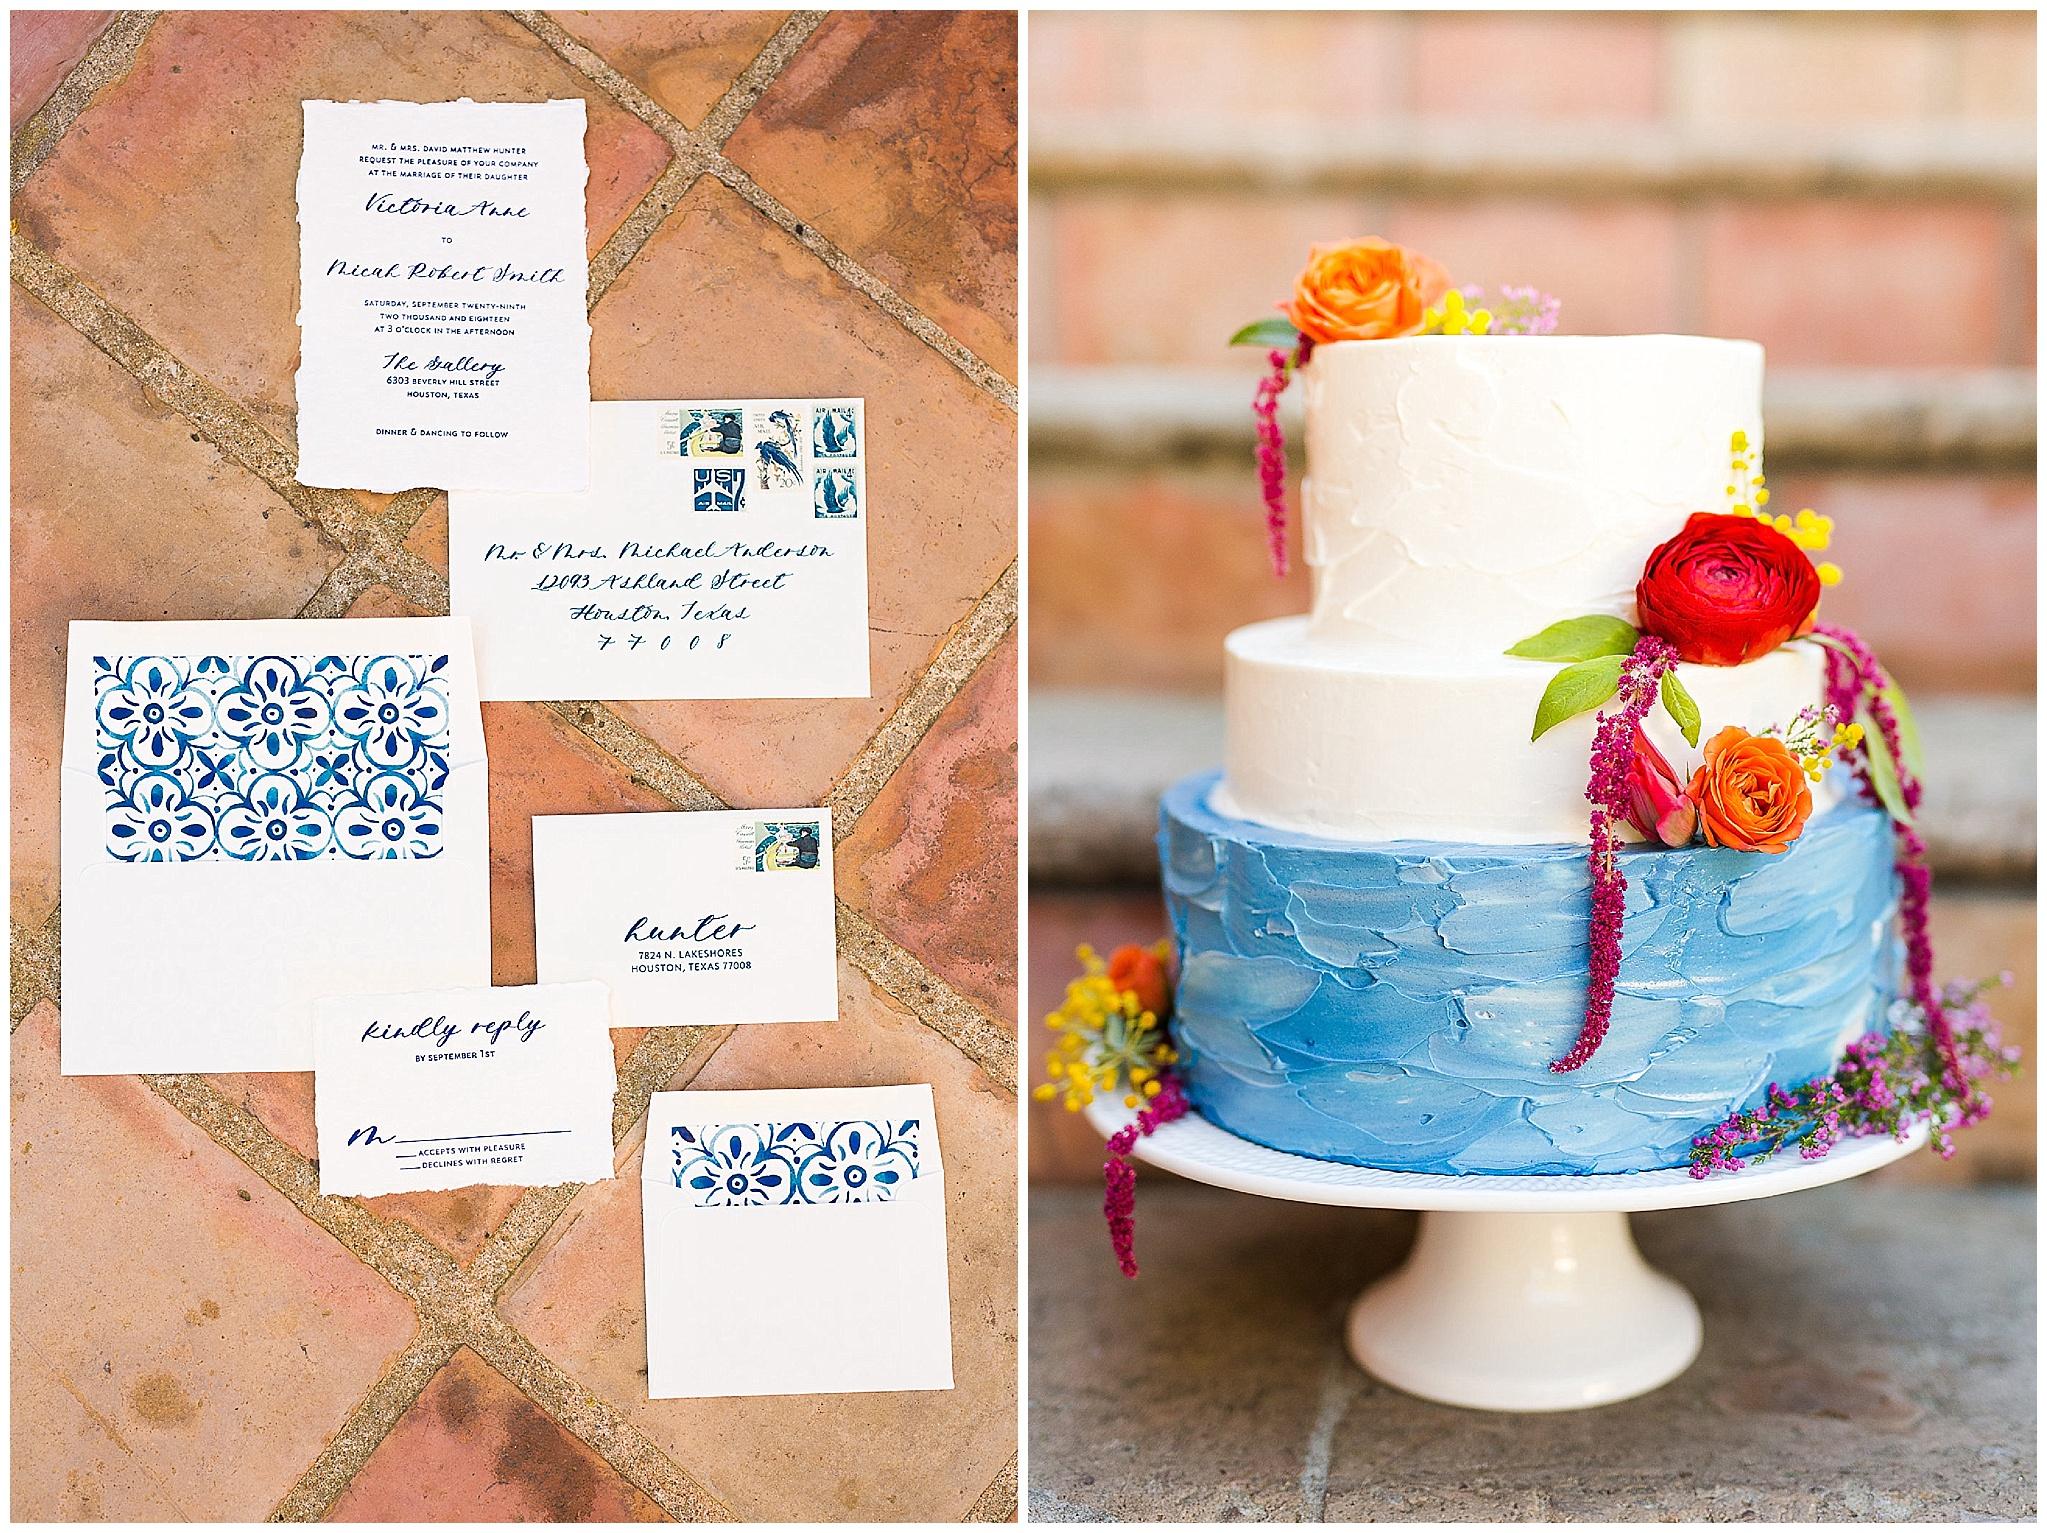 wedding-inspiration-houston-texas-bride-blog_0004.jpg